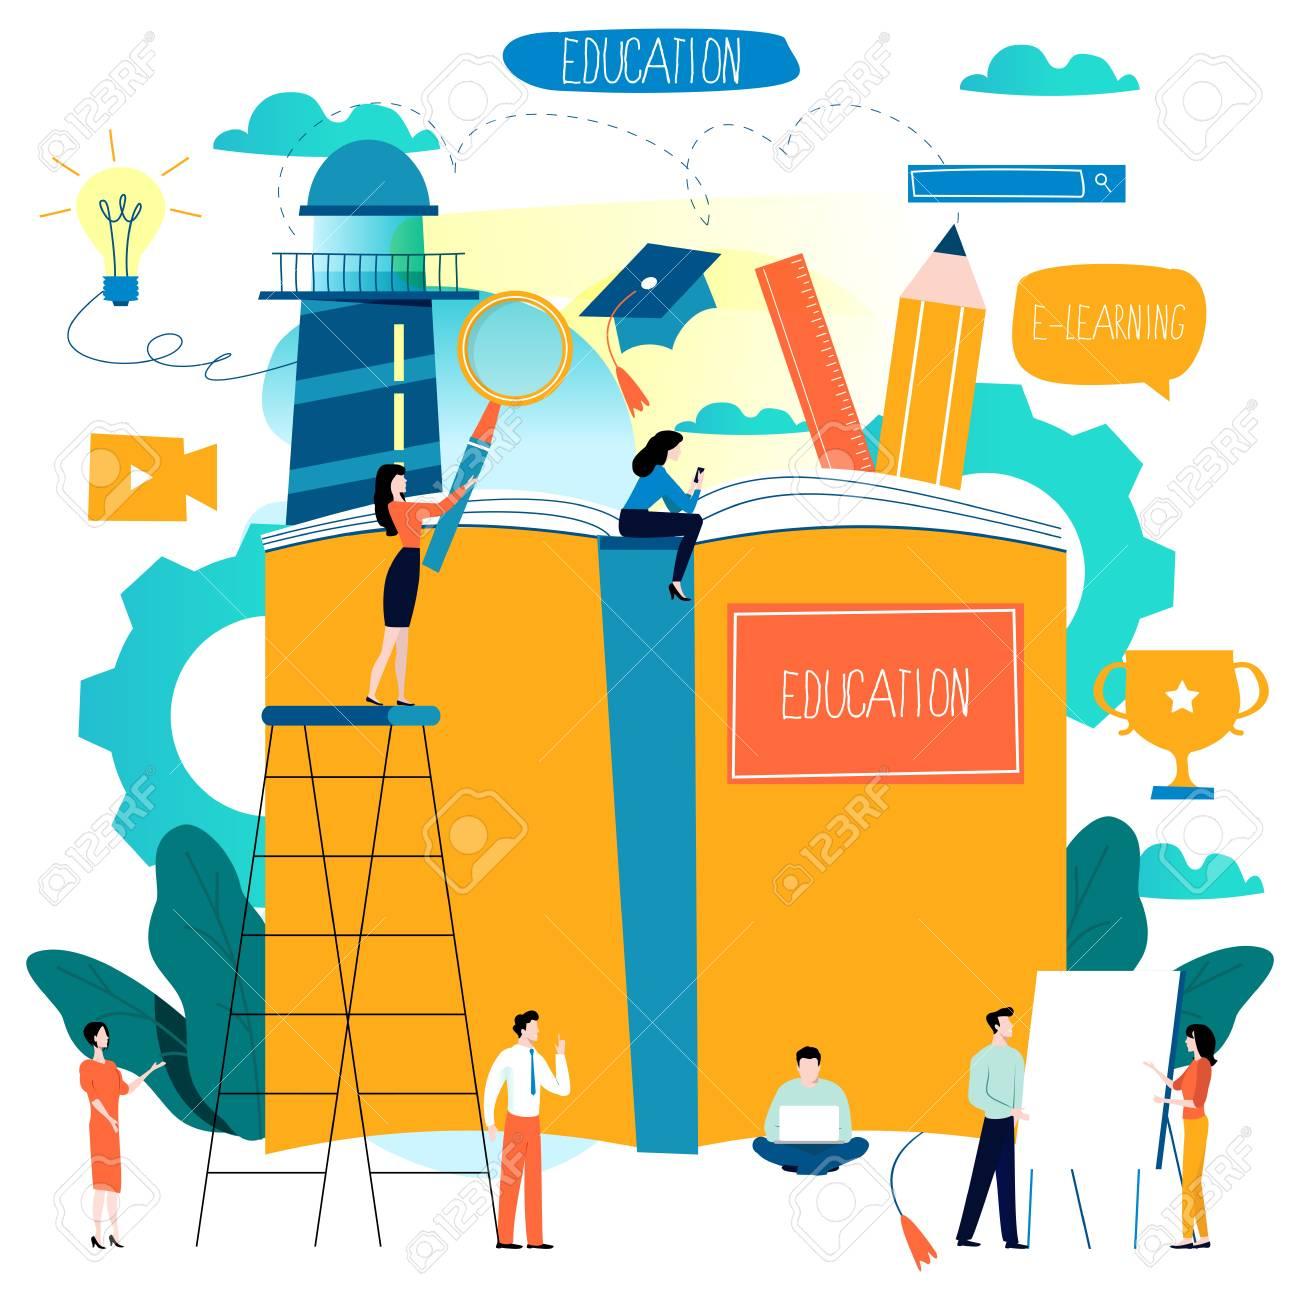 Education, online training courses, distance education flat vector illustration. - 96919242